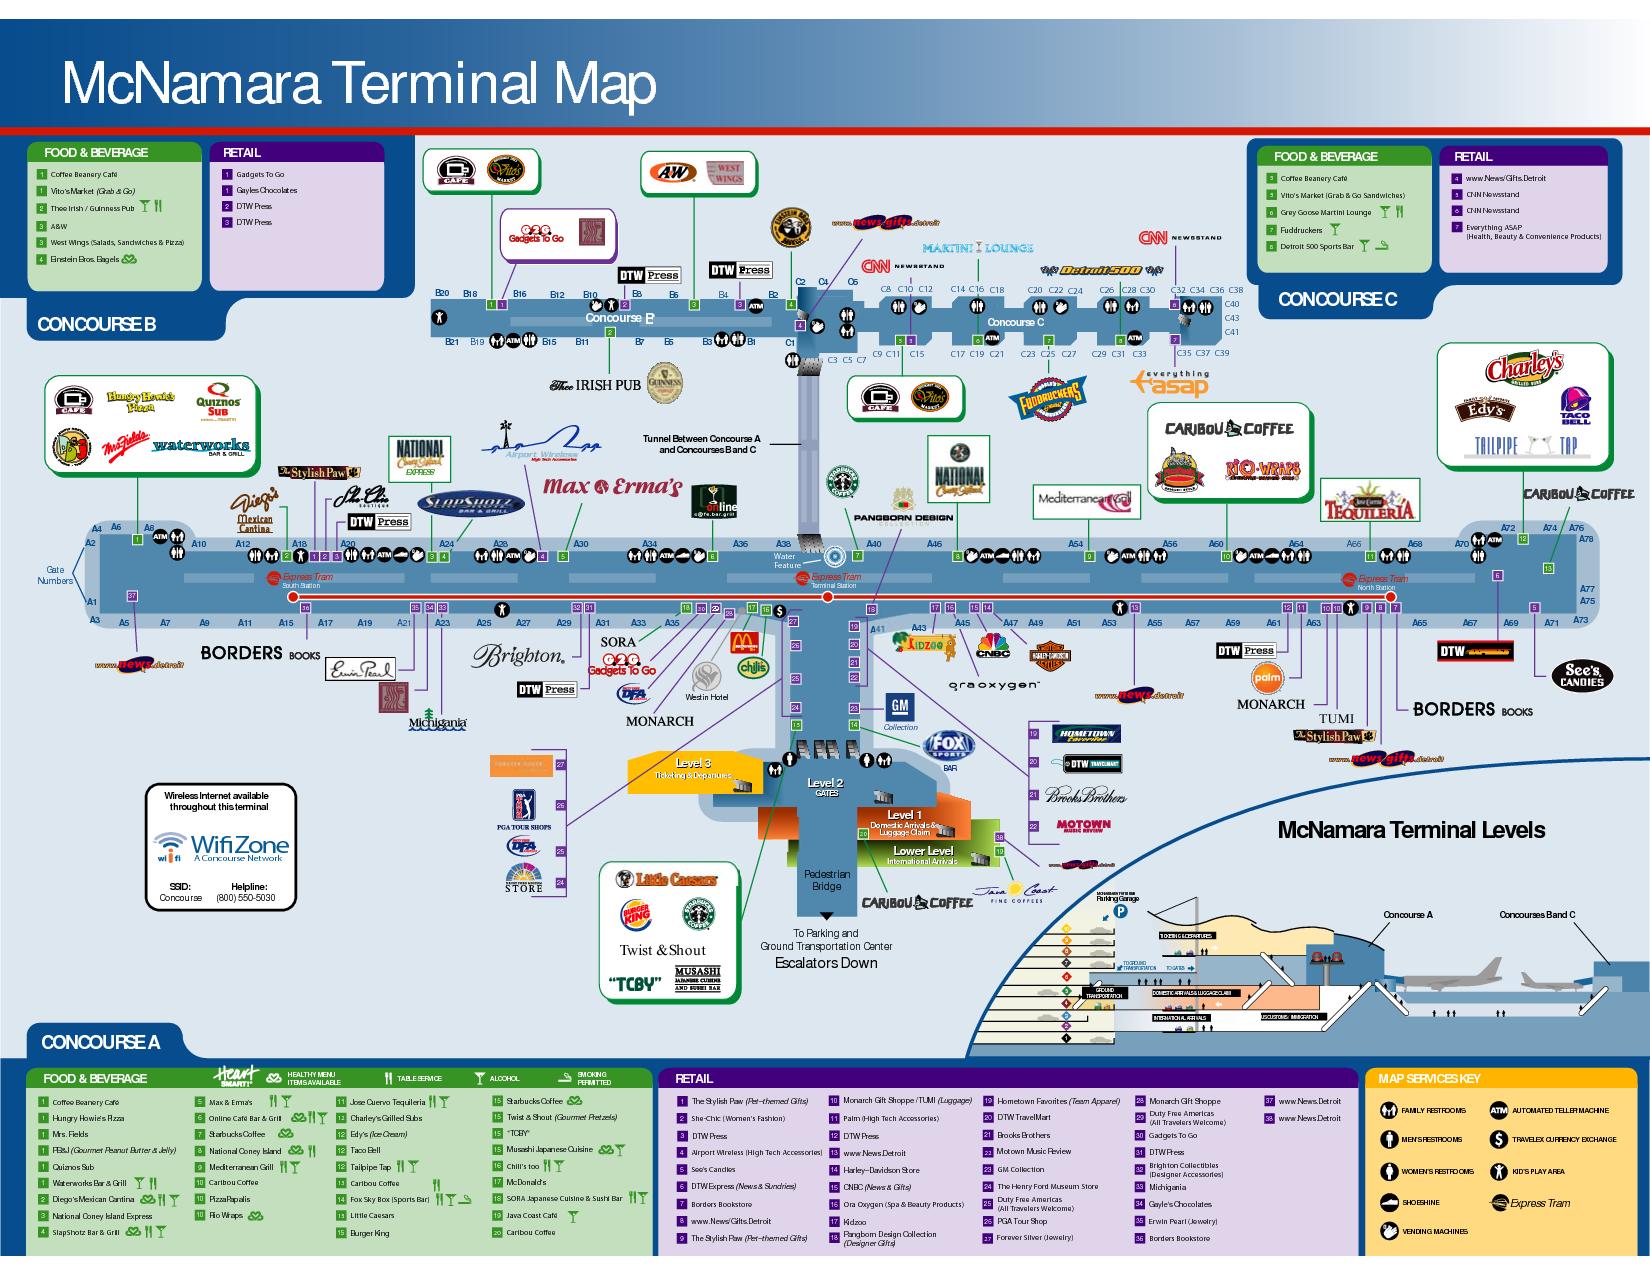 detroit airport delta gates  mcnamara terminal map food beverage foodbeverage retail food beverage. detroit airport delta gates  mcnamara terminal map food beverage